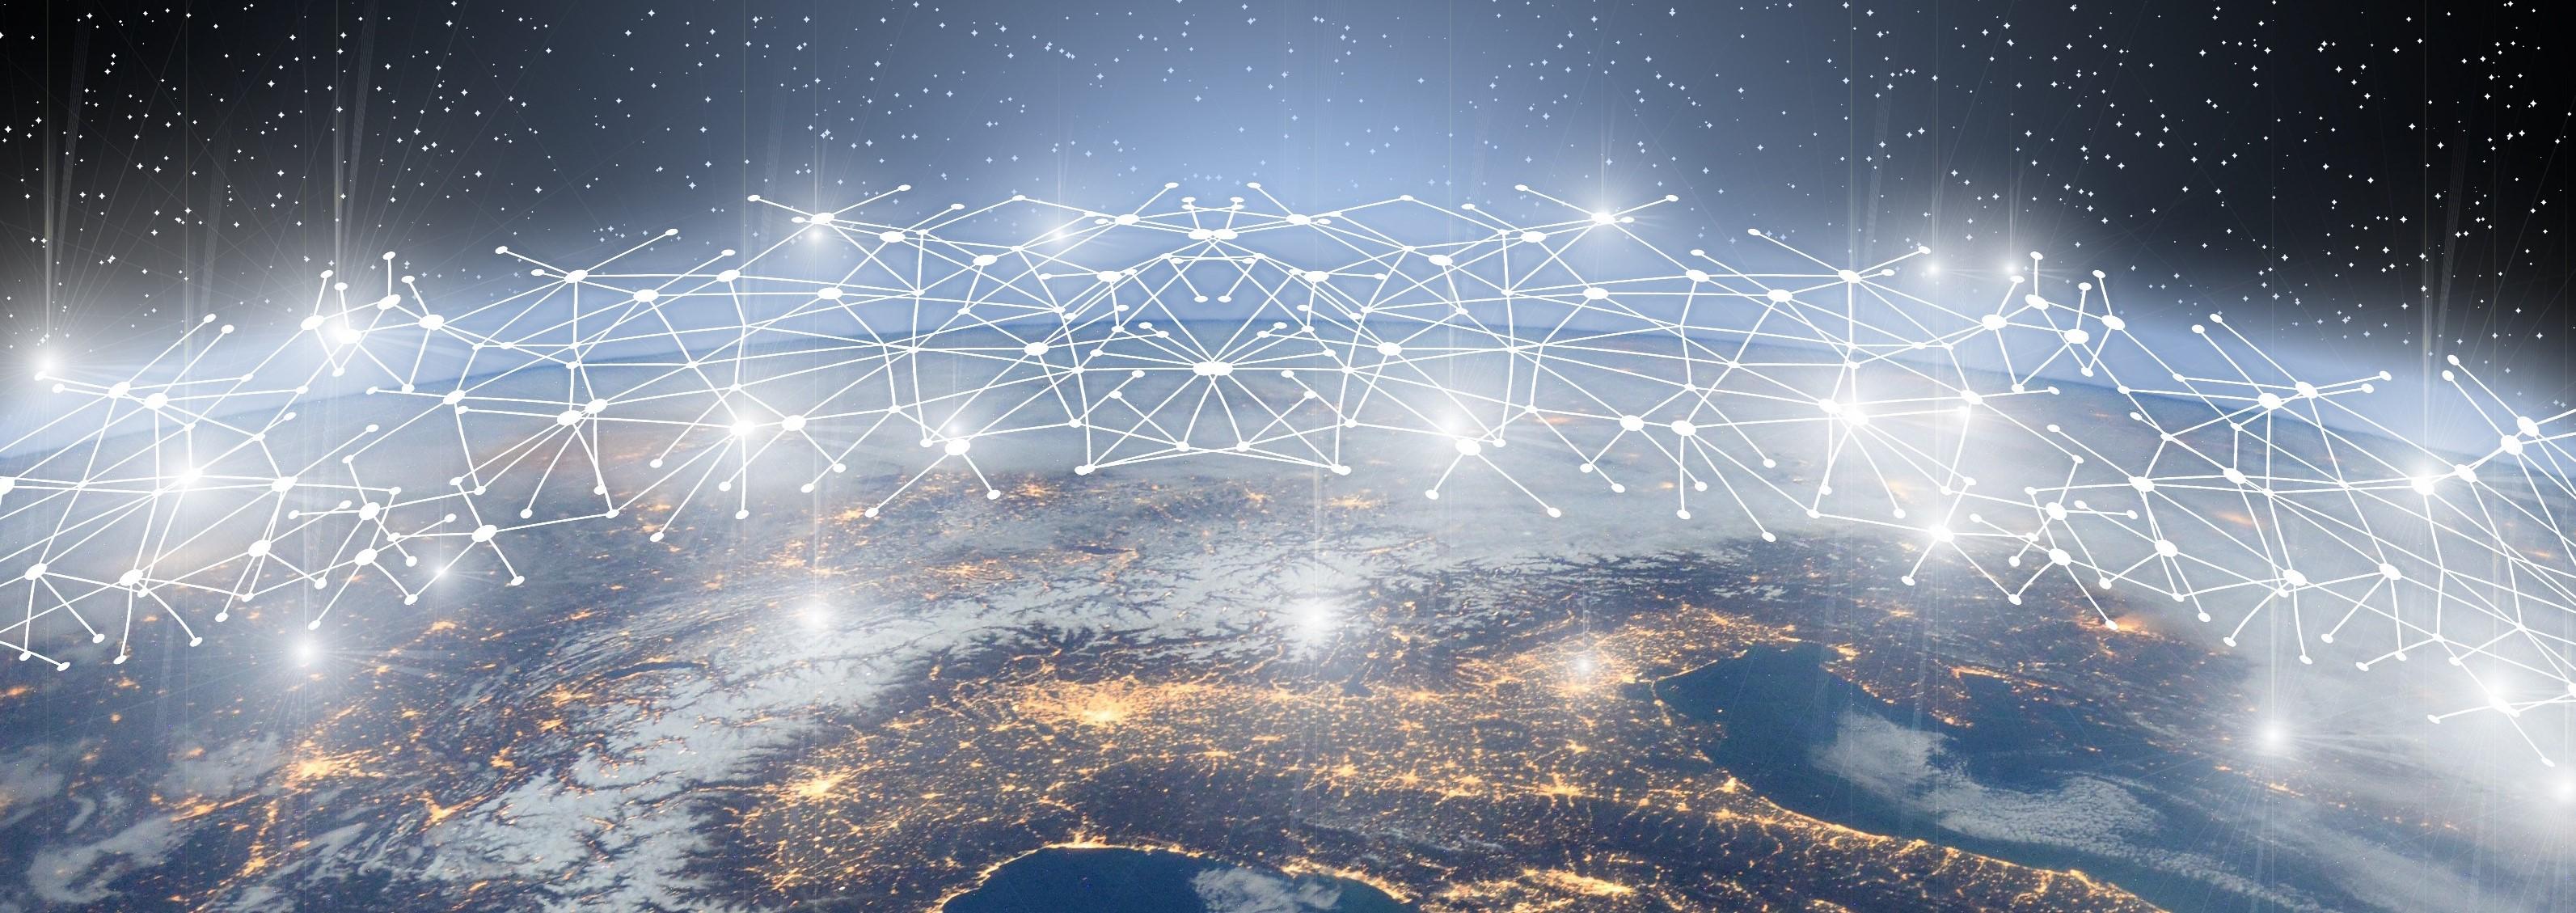 Network across the world